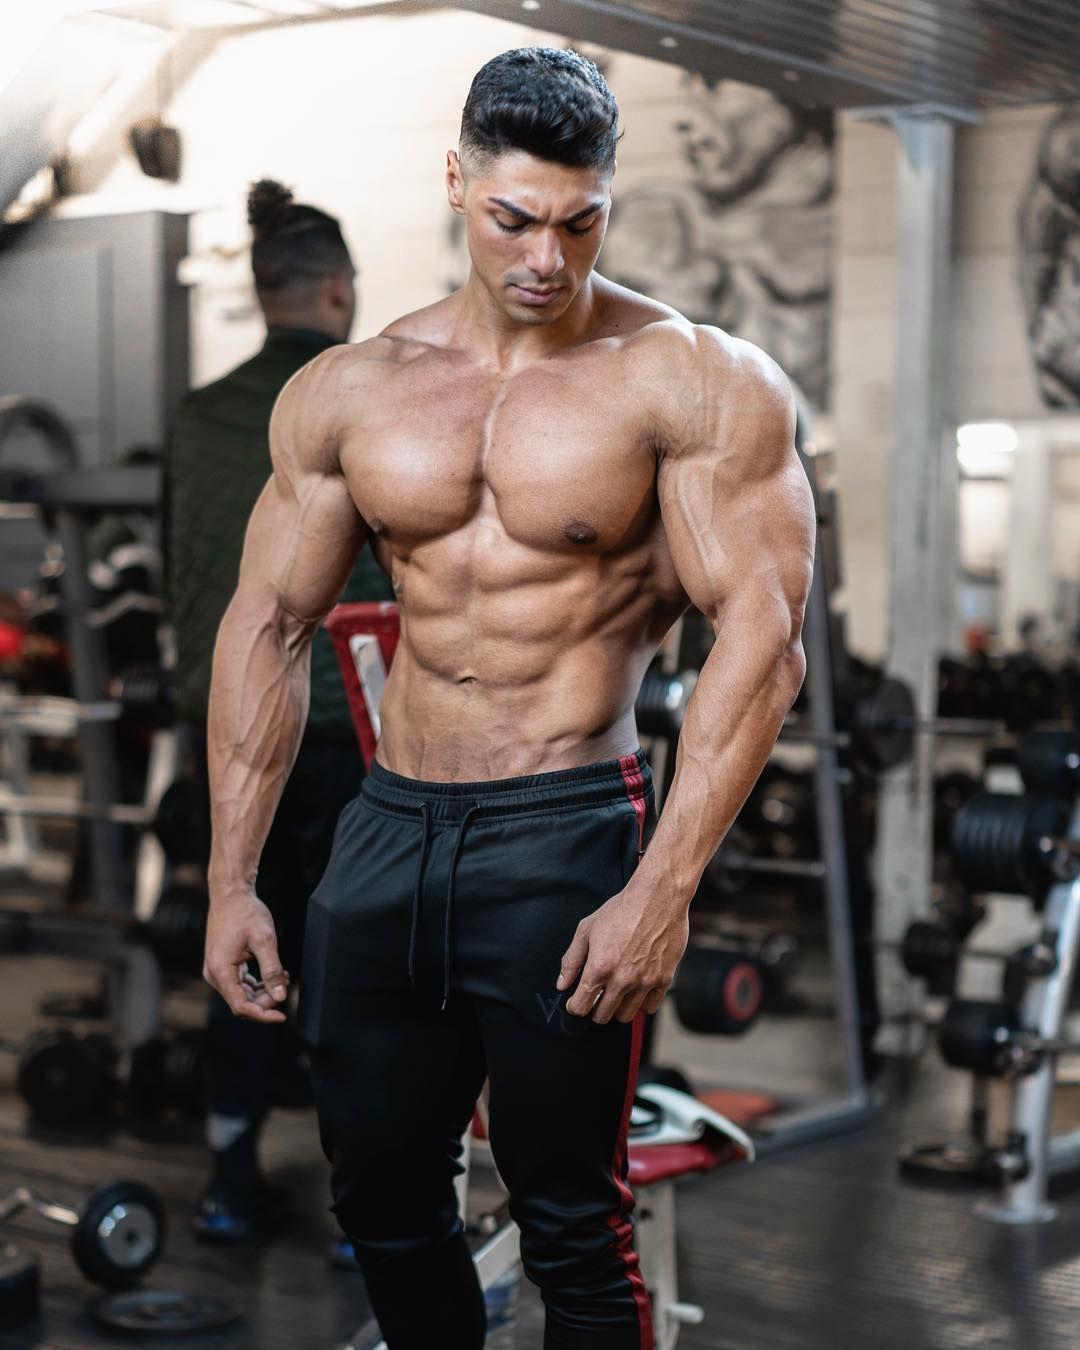 Bodybuilding, Fitness Motivation